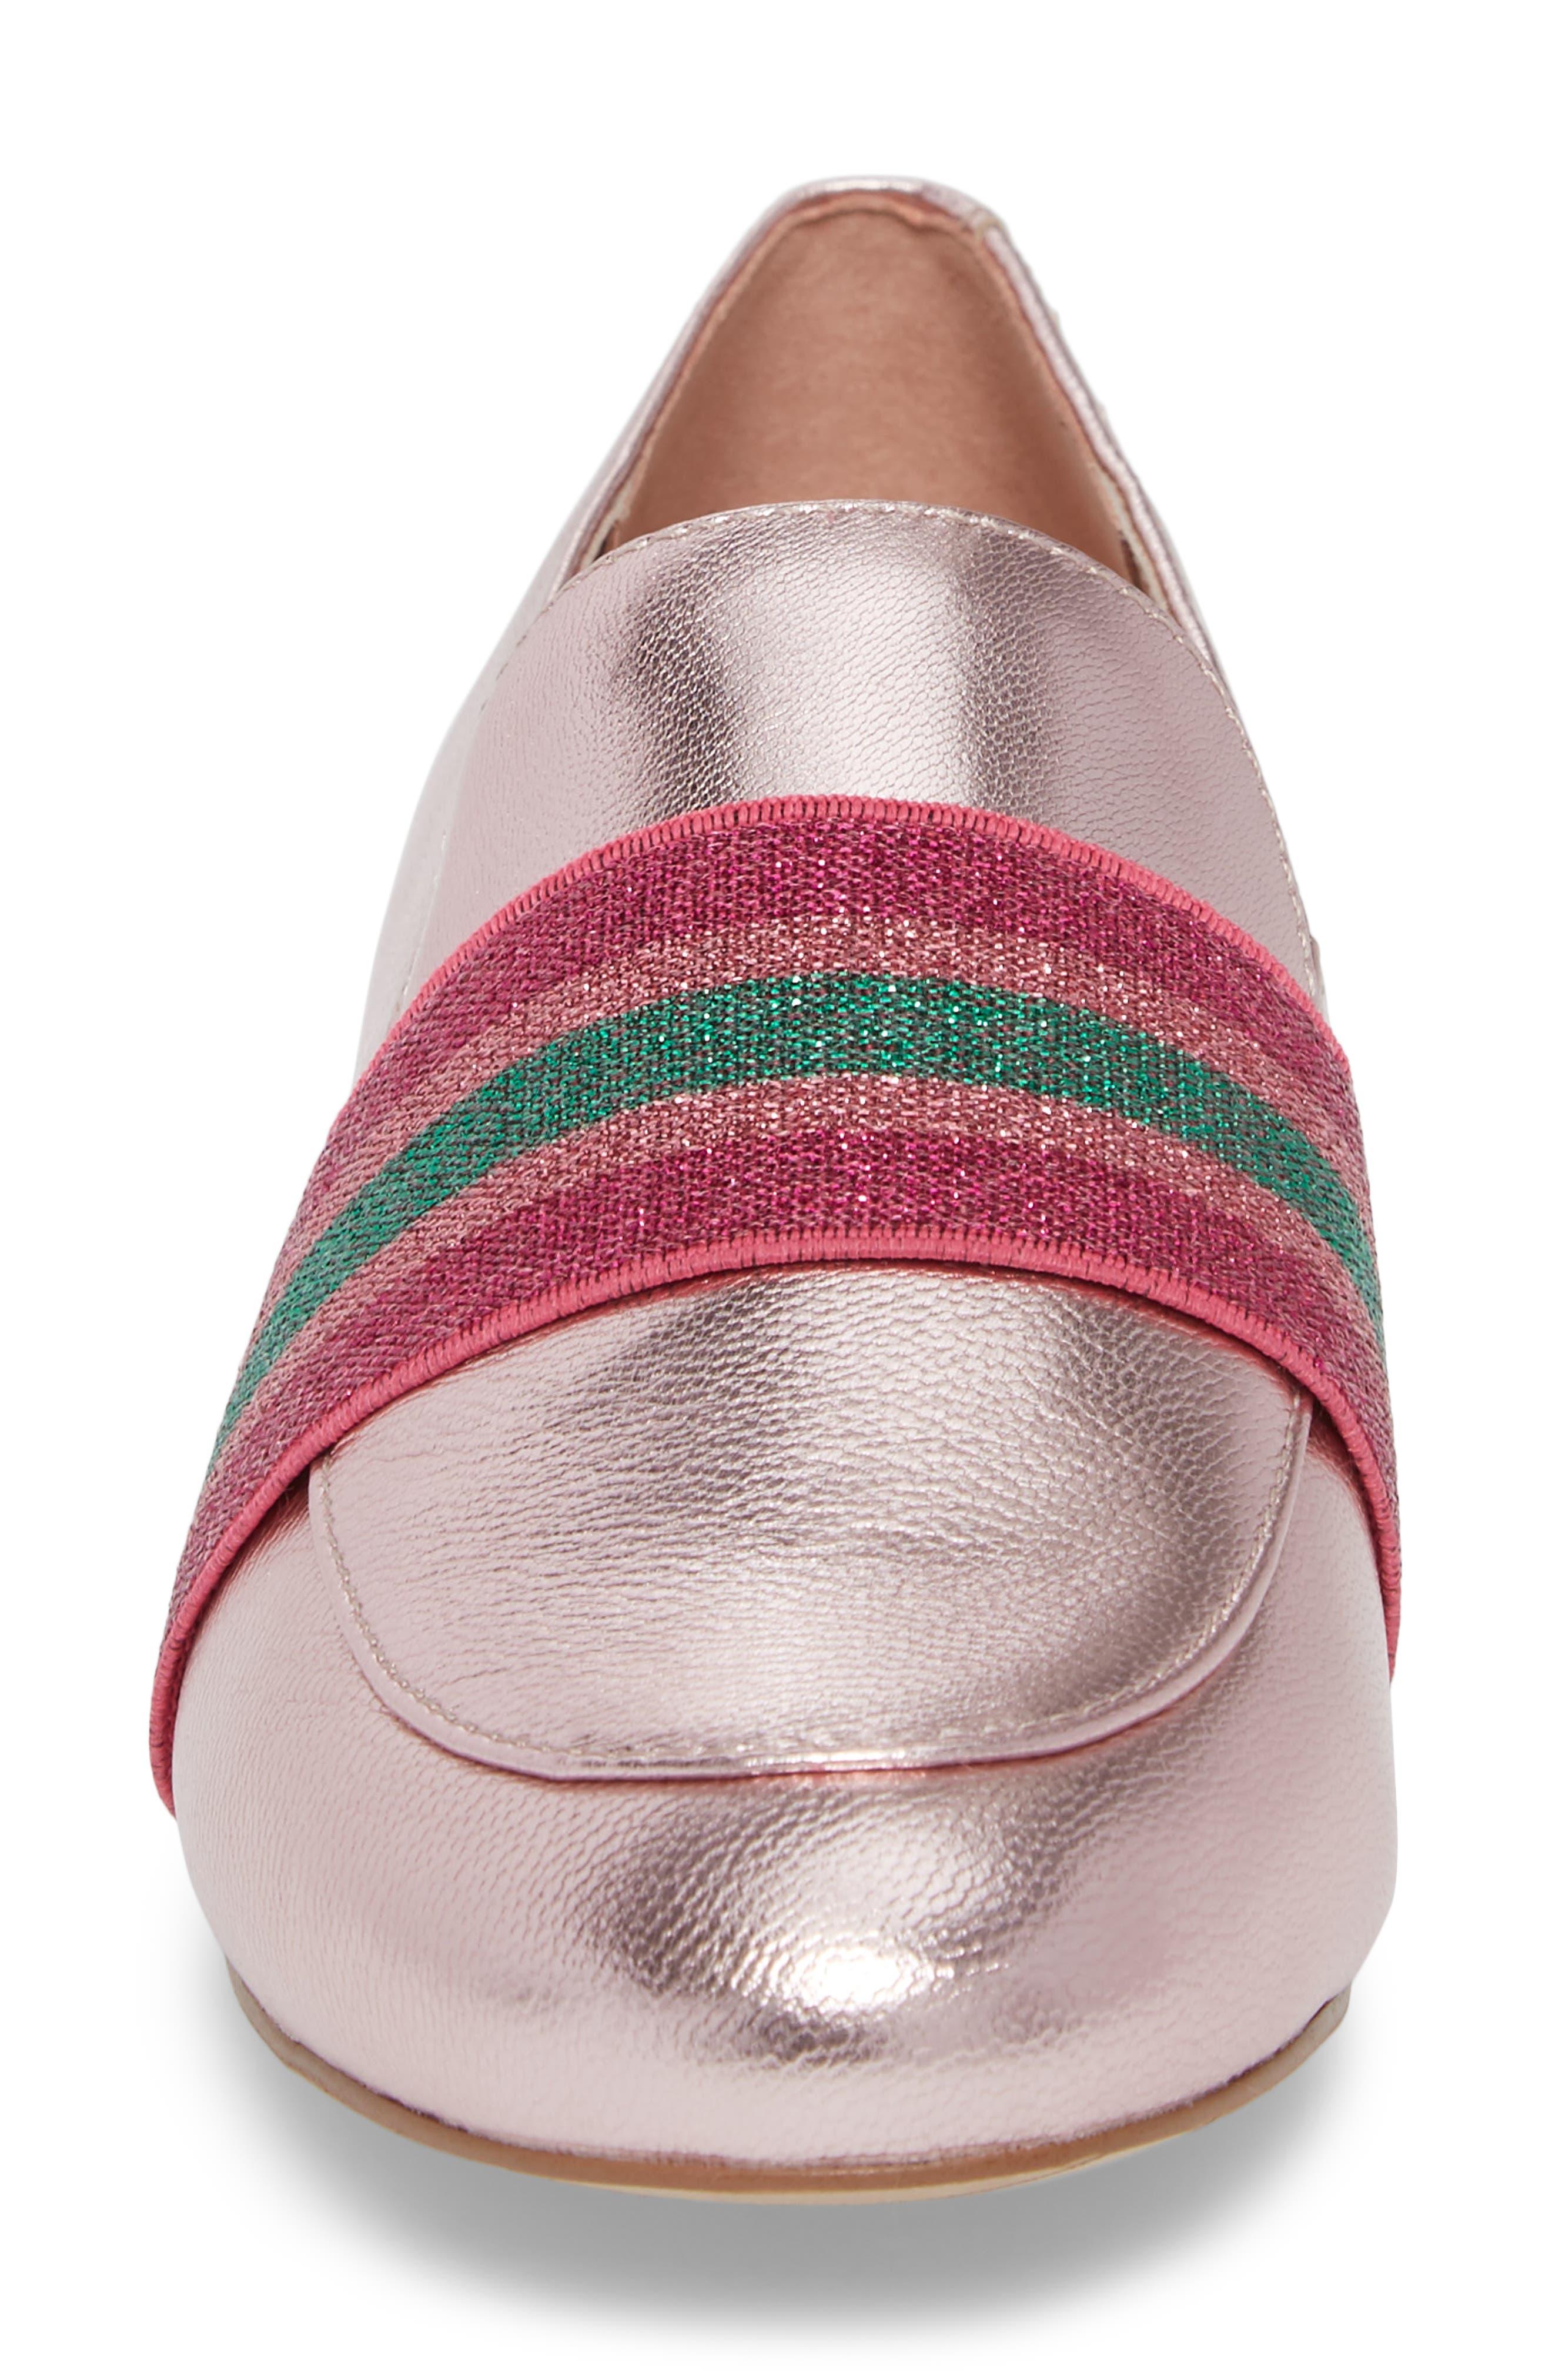 Walden Loafer,                             Alternate thumbnail 4, color,                             Pink Metallic Leather